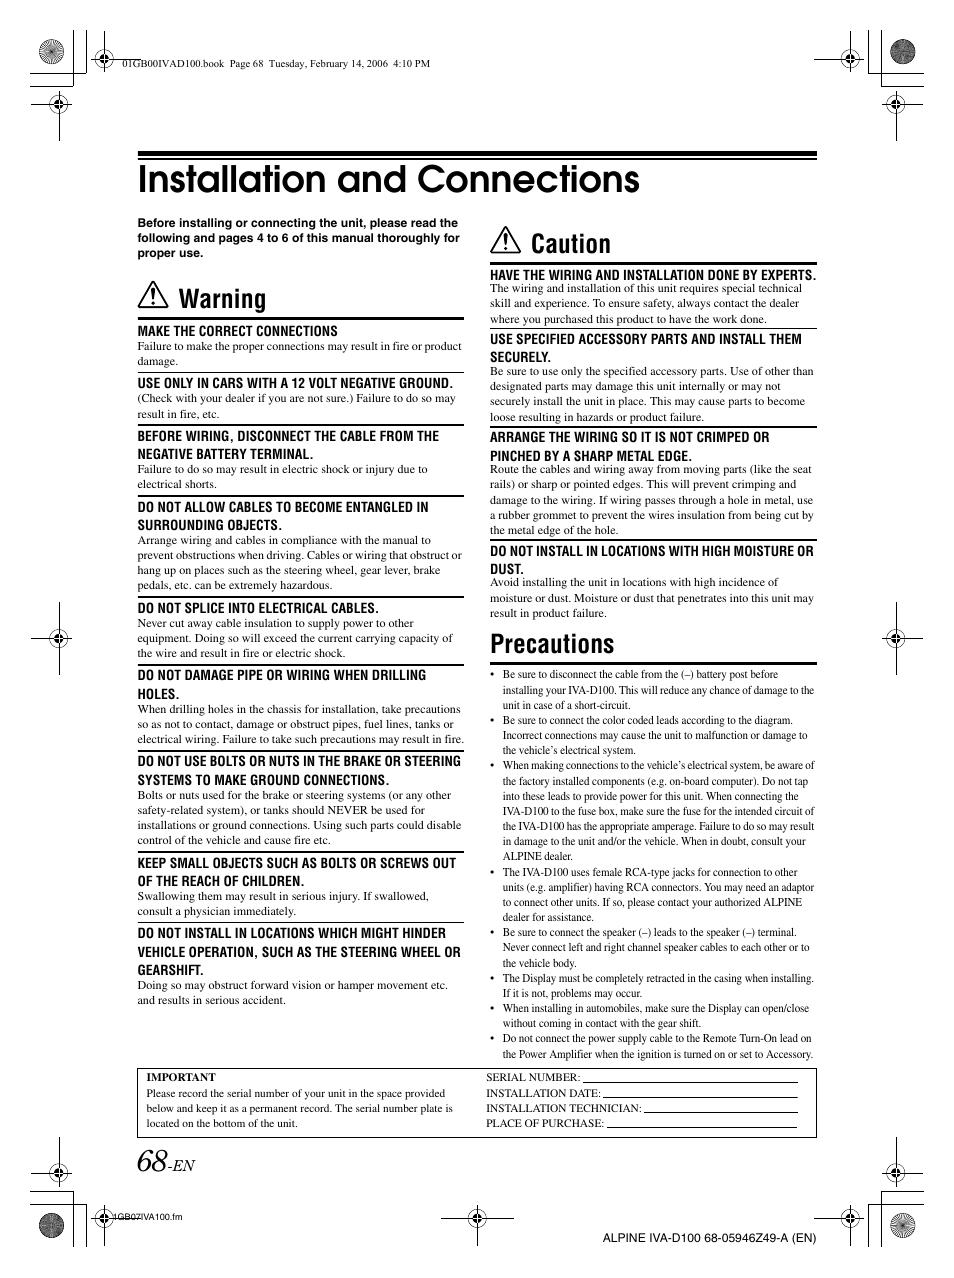 Breathtaking Jcb Ac Wiring Diagram Contemporary ufc204 – Jcb 525 50 Wiring Diagram